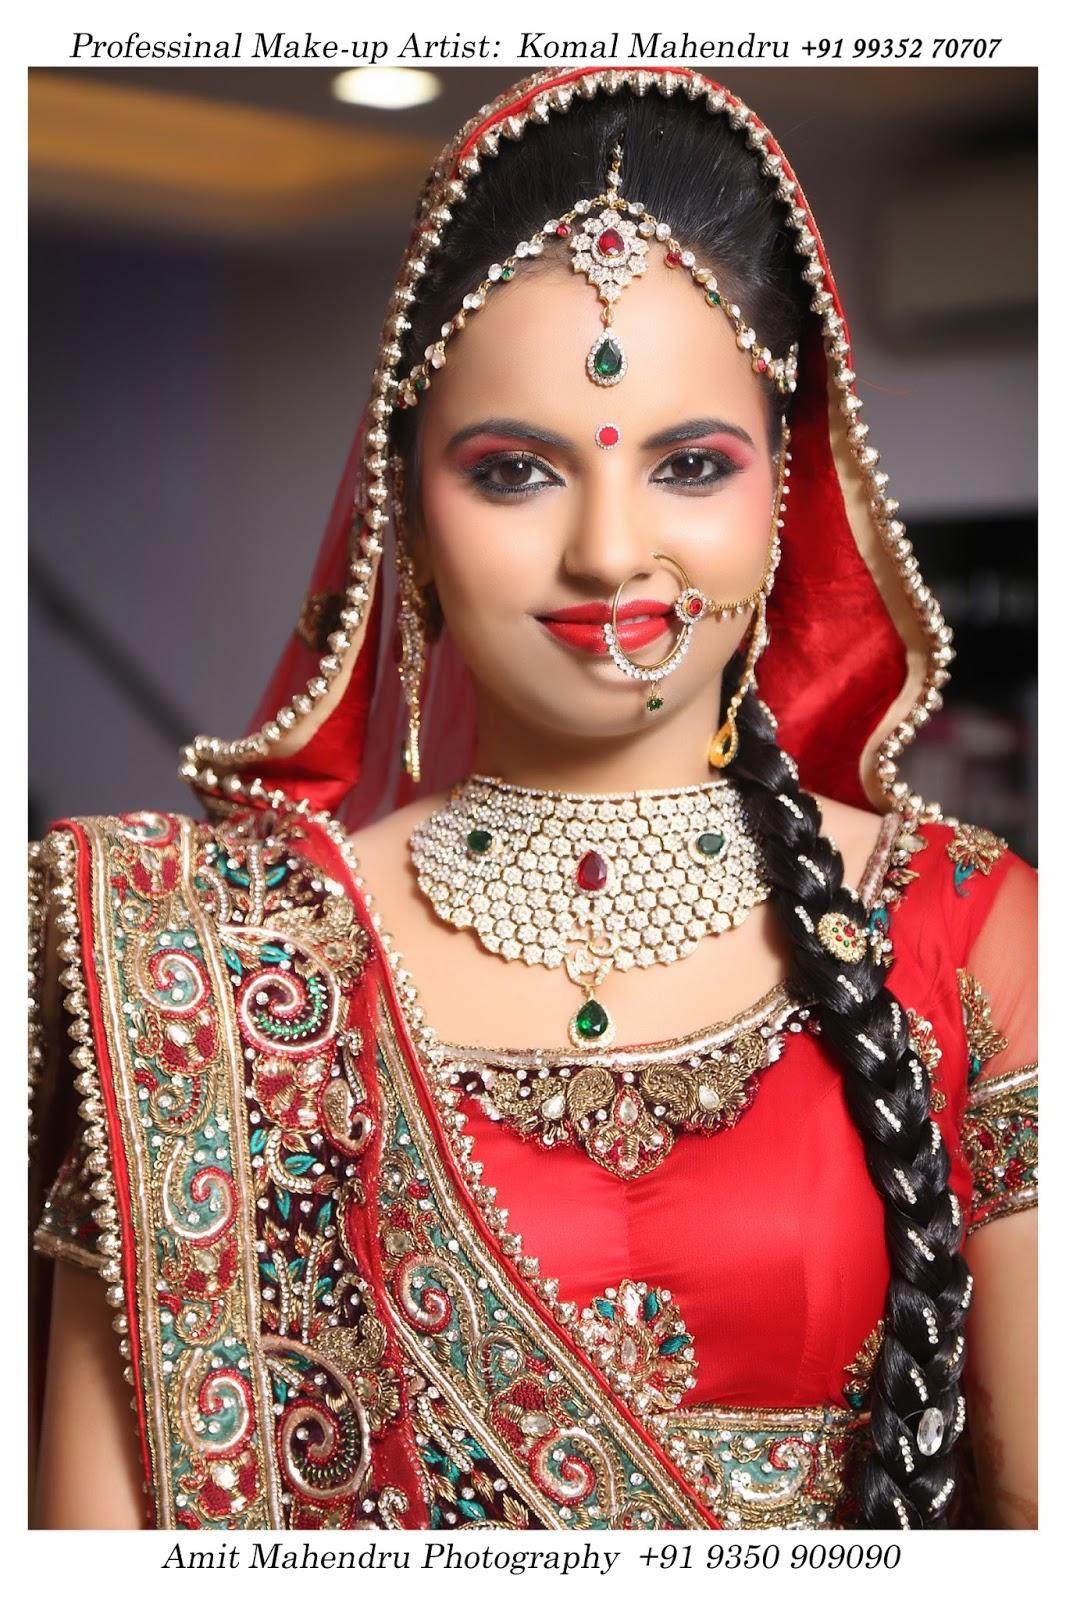 Komal mahendru s professional makeup lucknow india bridal makeup - Professional Makeup Artist In Lucknow Https Www Facebook Com Komal Mahendru